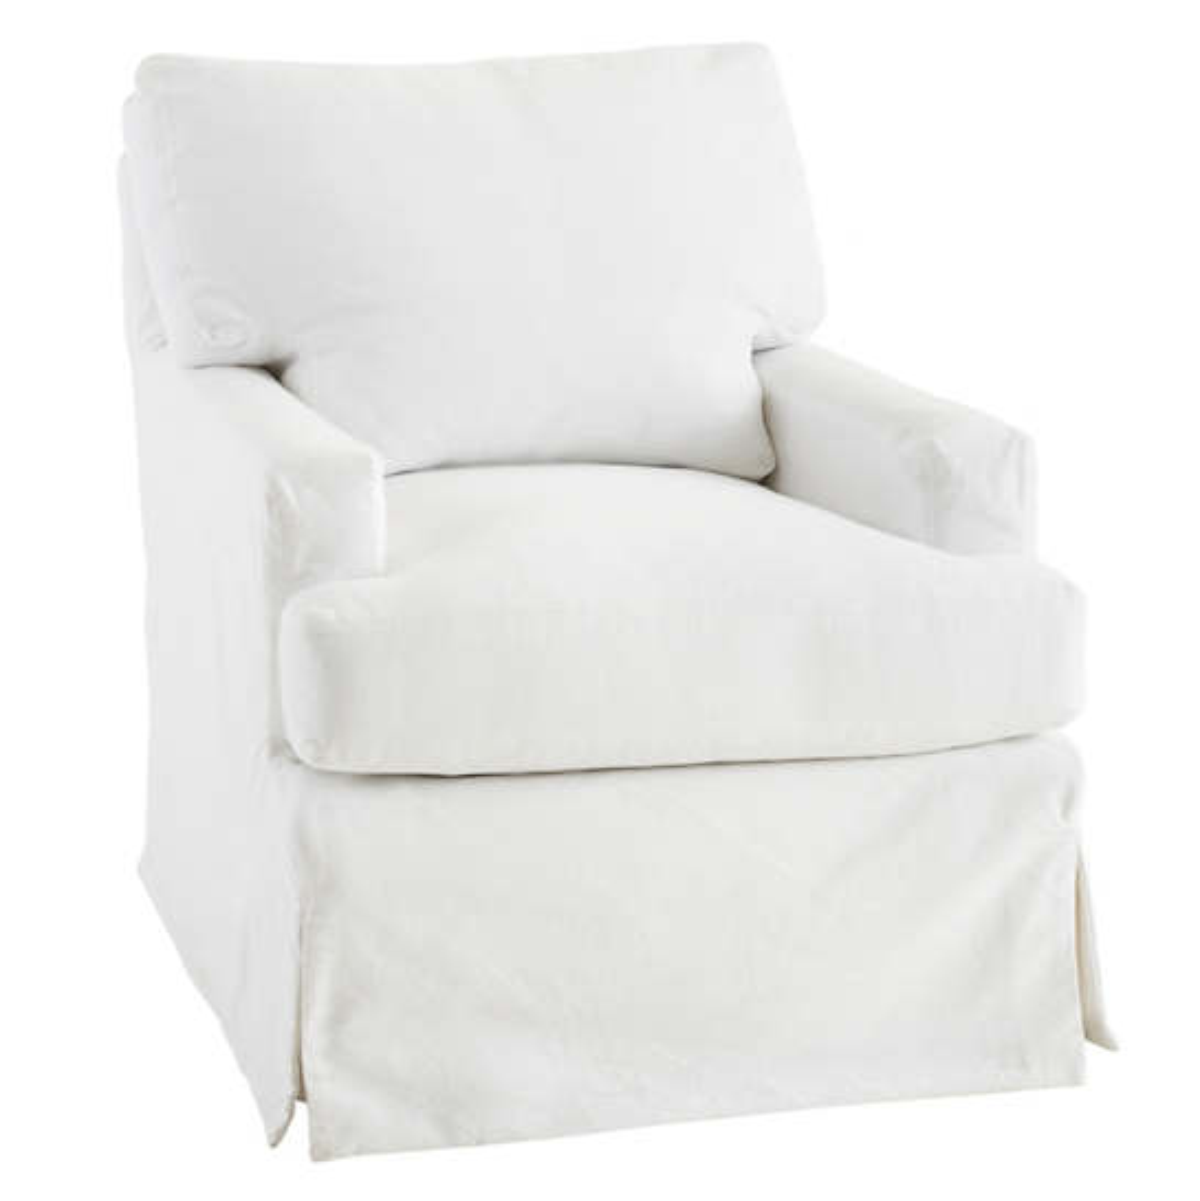 White Saybrook Slipcovered Chair